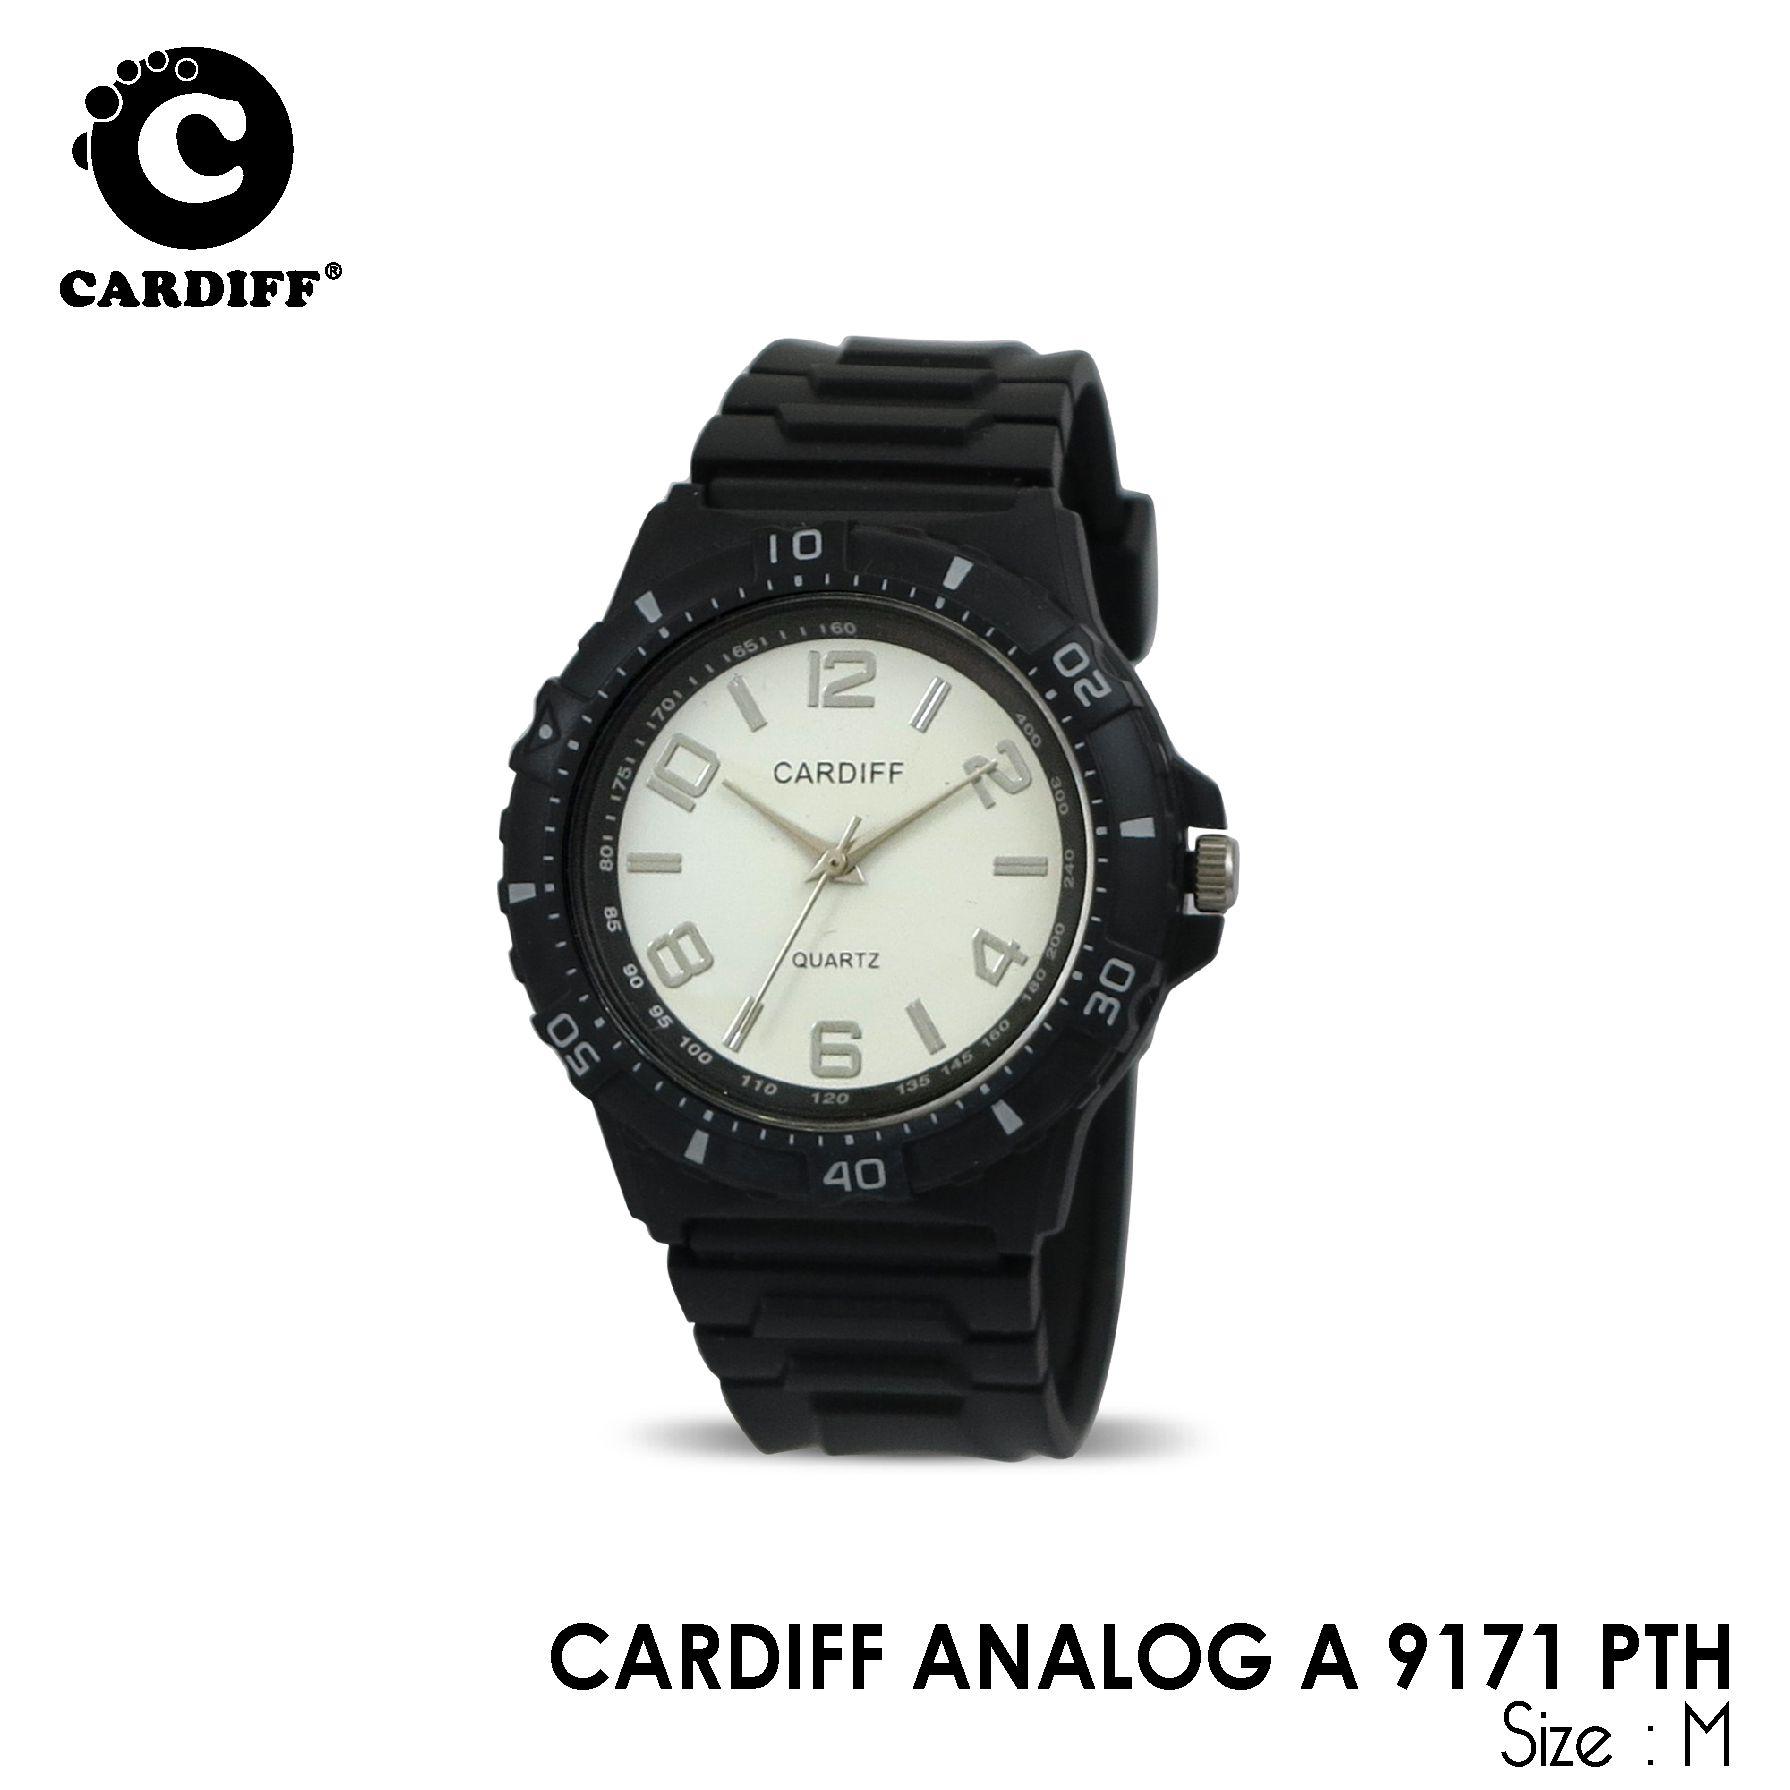 Cardiff Analog A 9171